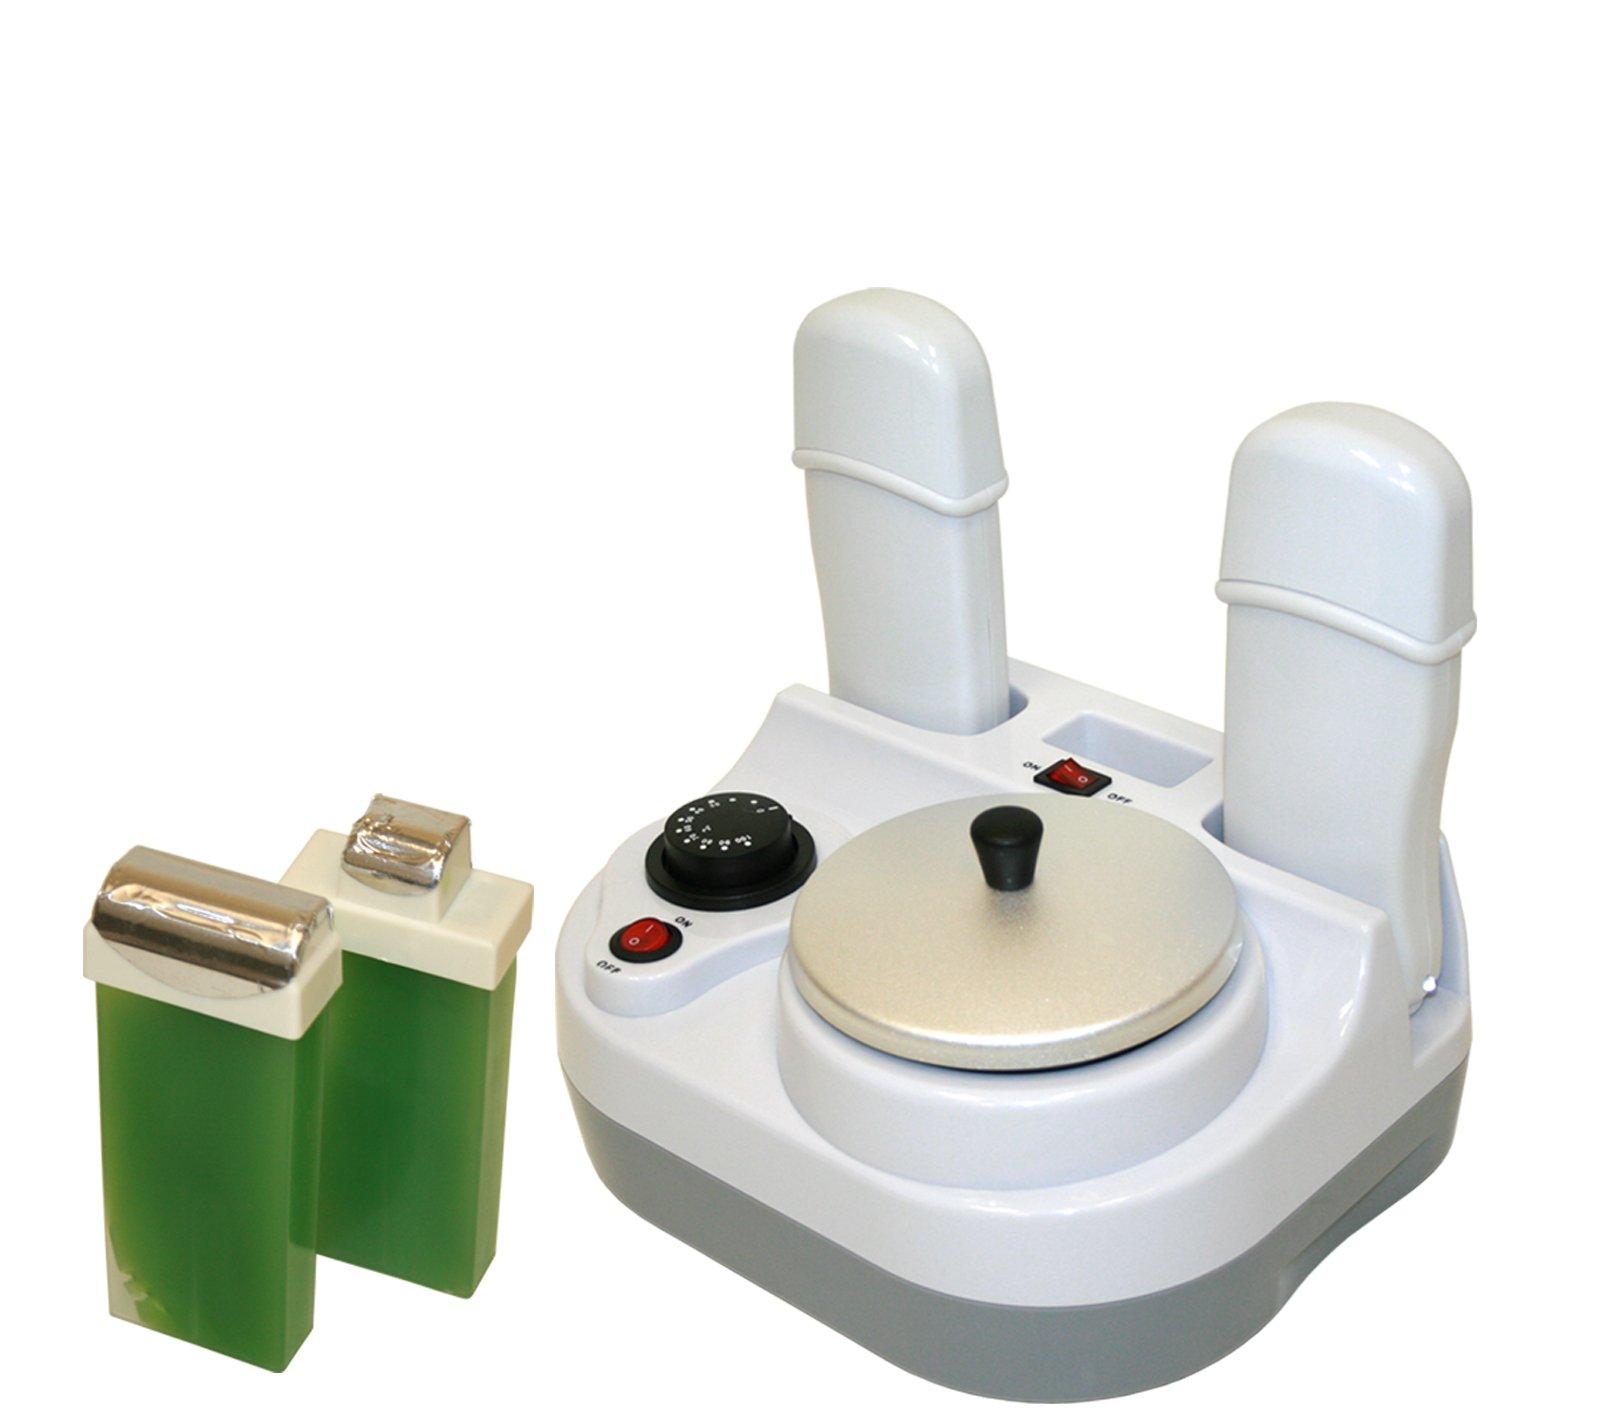 LCL Beauty Professional 2-in-1 (Pot & Double Cartridge) Wax Heater